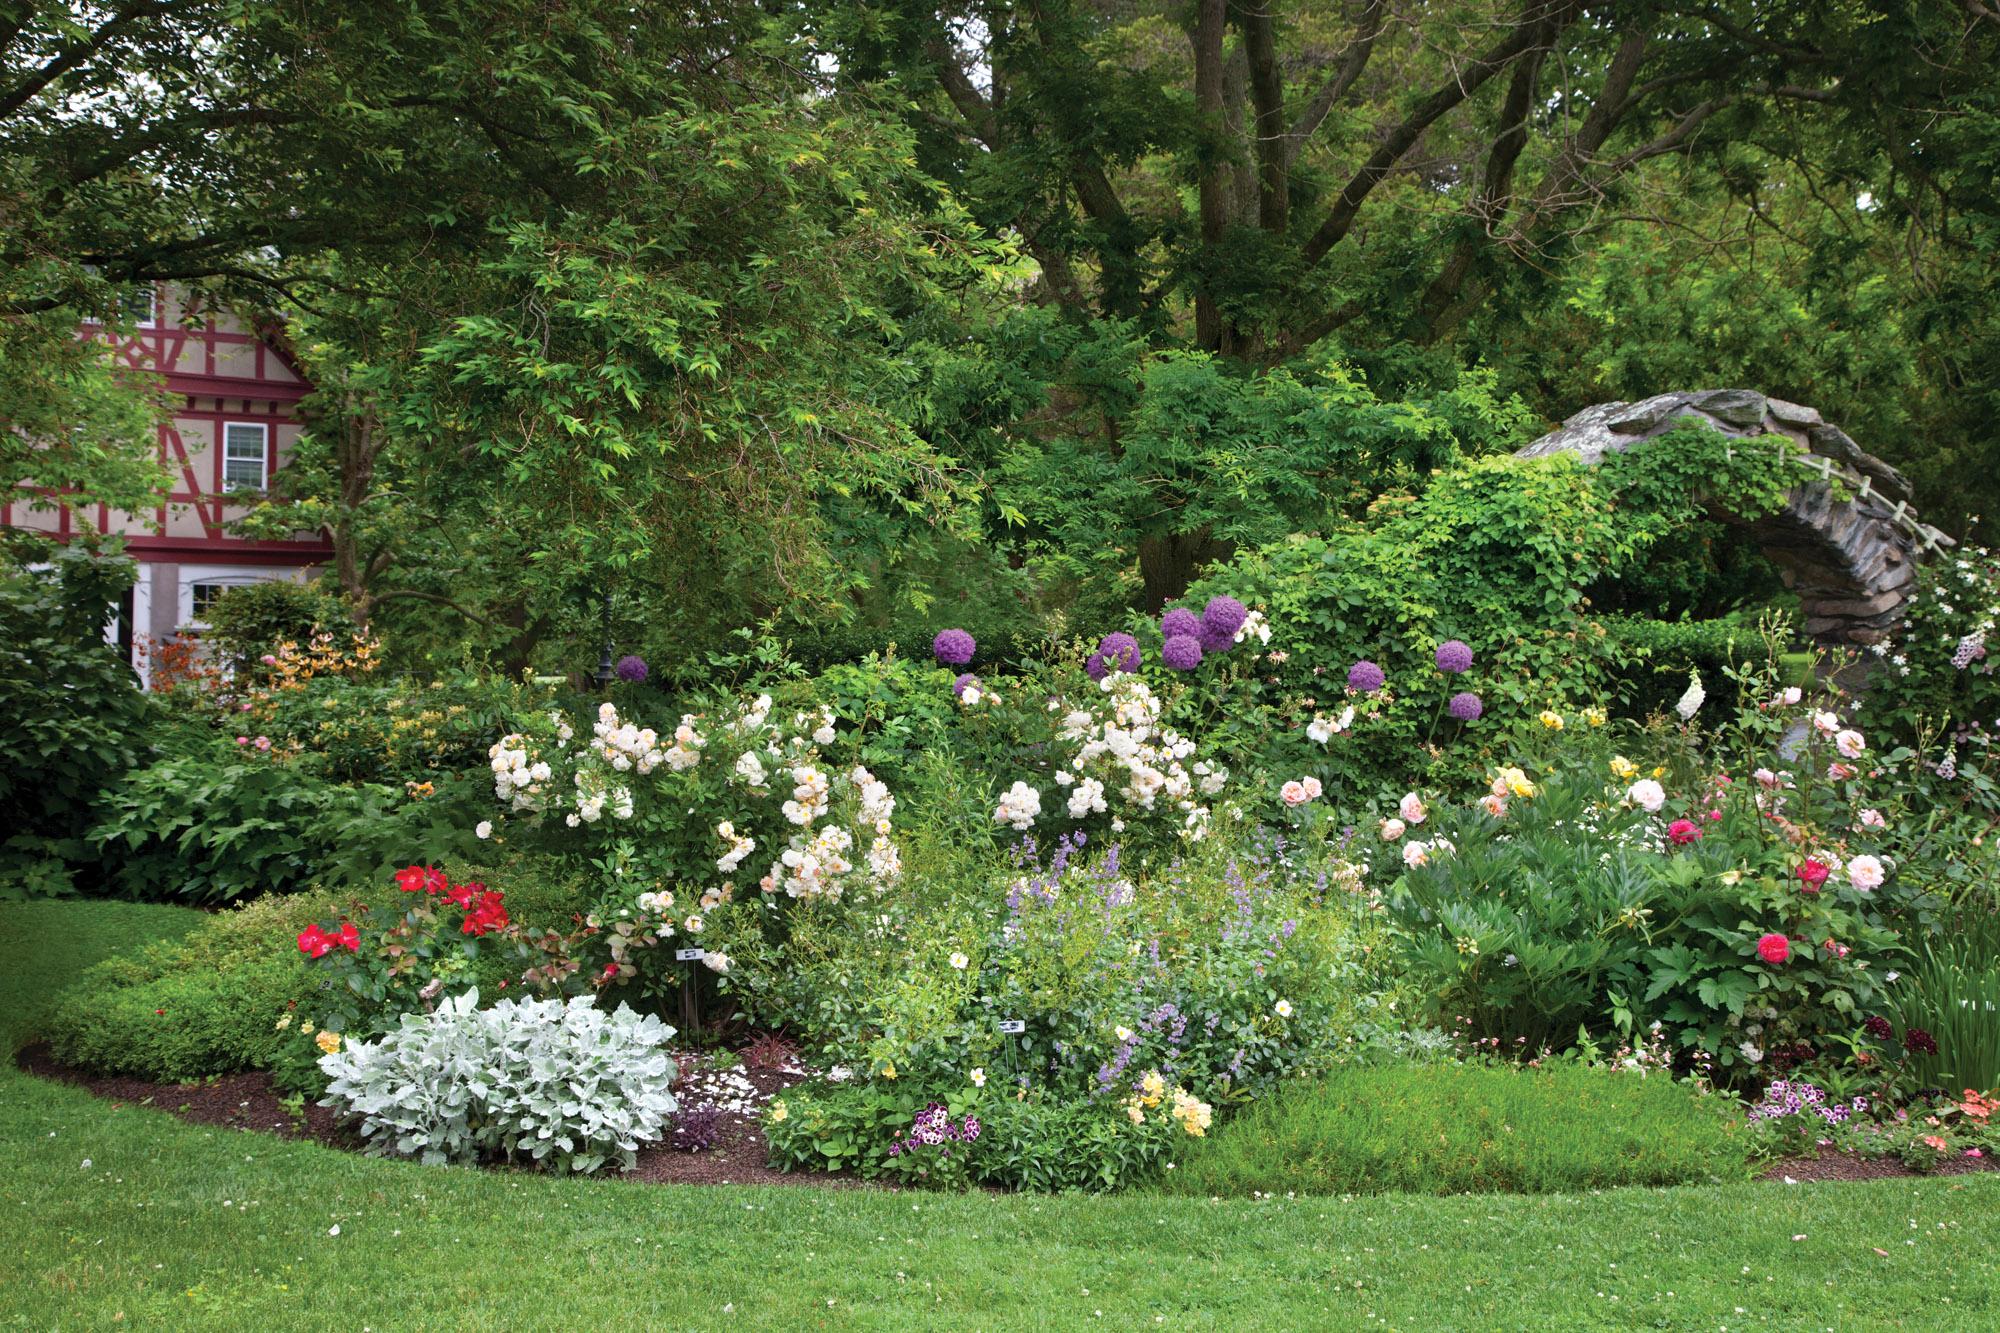 The Inspiring Gardens of Blithewold